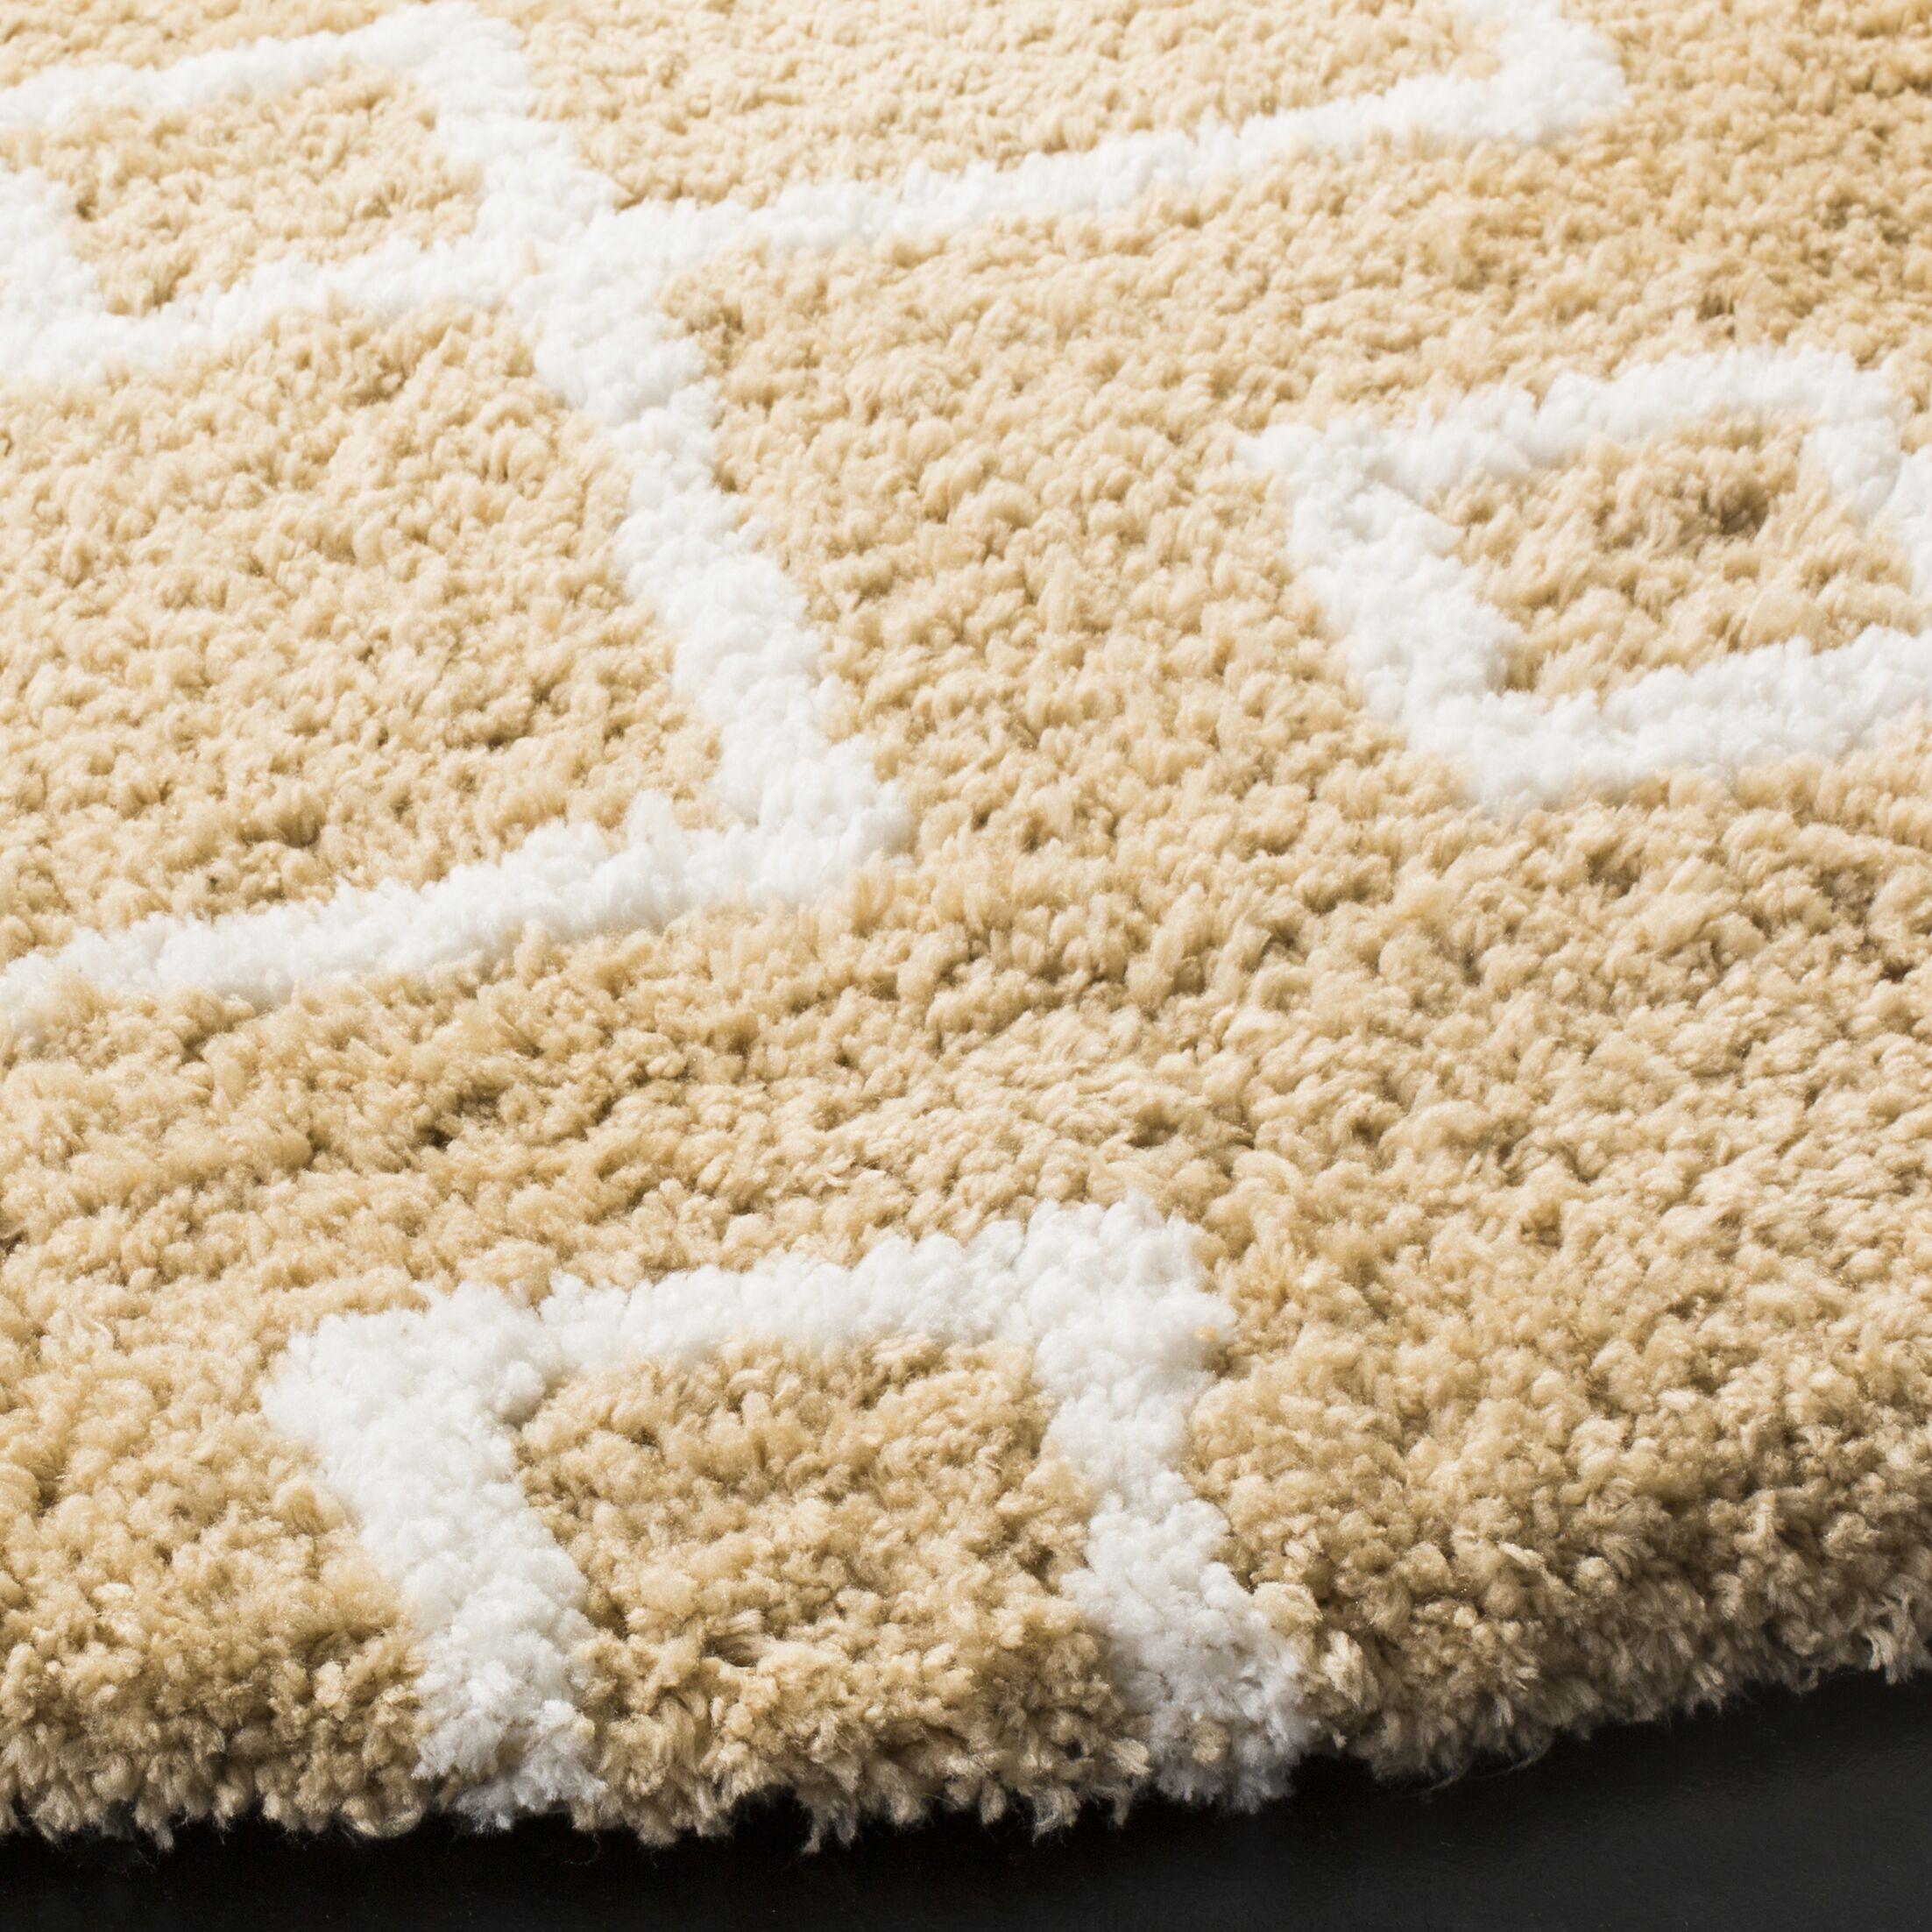 Shead Hand-Tufted Beige/Ivory Area Rug Rug Size: Rectangle 3' x 5'